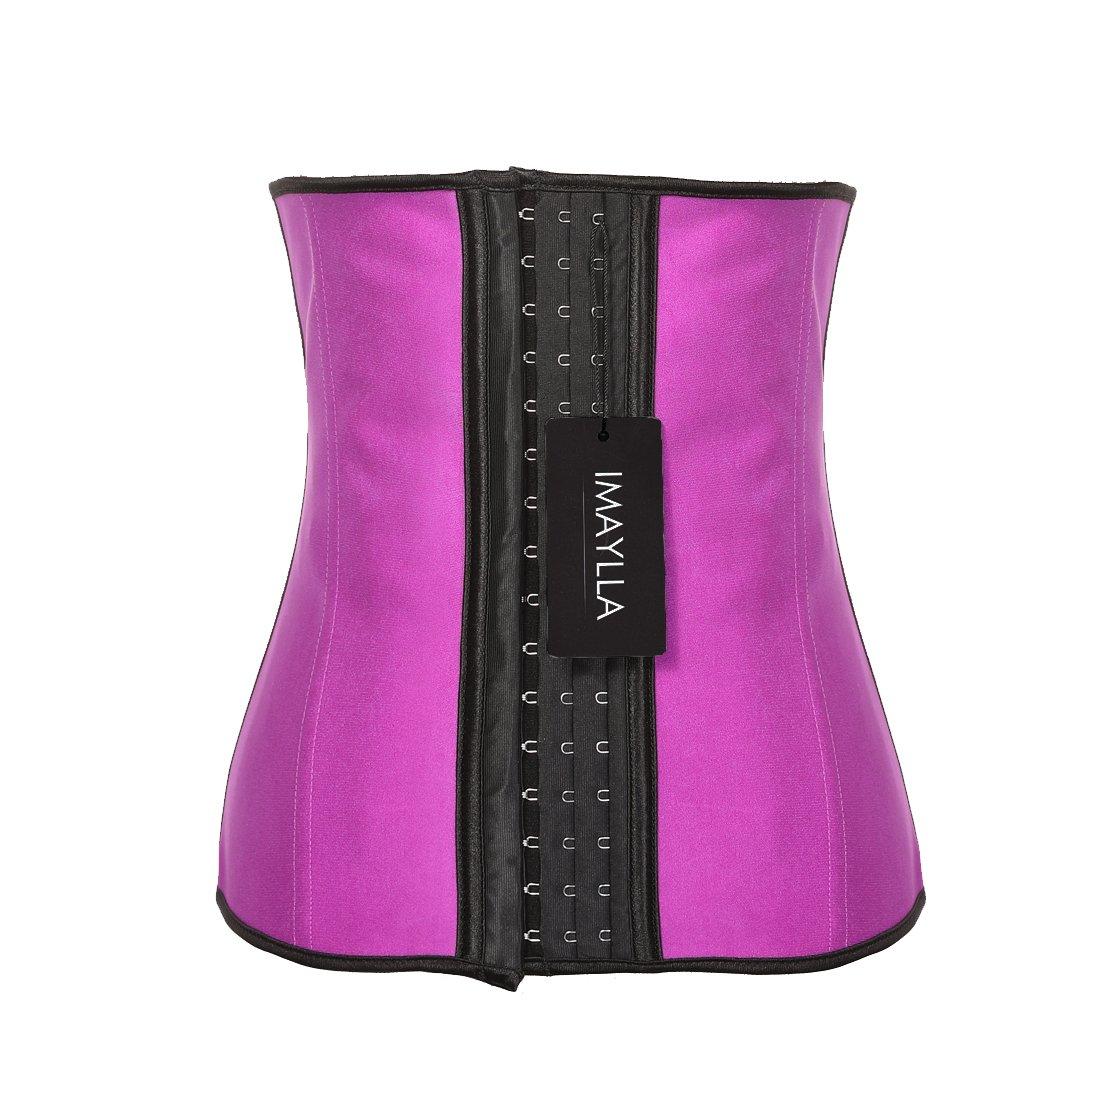 23f56542bc5 Amazon.com   IMAYLLA Shapewear For Women Breathable trimmer belt Cincher  Waist Trainer Underbust Shapewear Waist girdle For dress   Sports   Outdoors